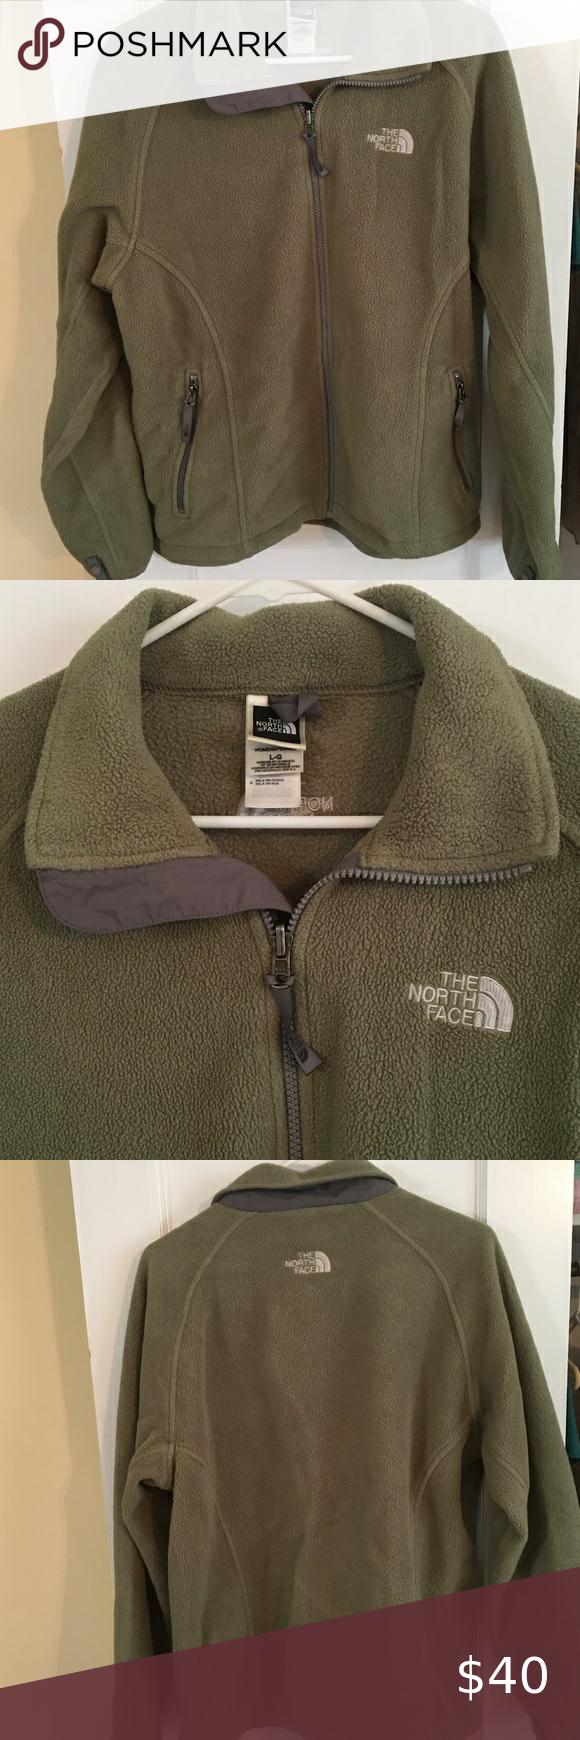 Olive Green North Face Polartec Fleece Jacket Polartec Fleece Fleece Jacket The North Face [ 1740 x 580 Pixel ]